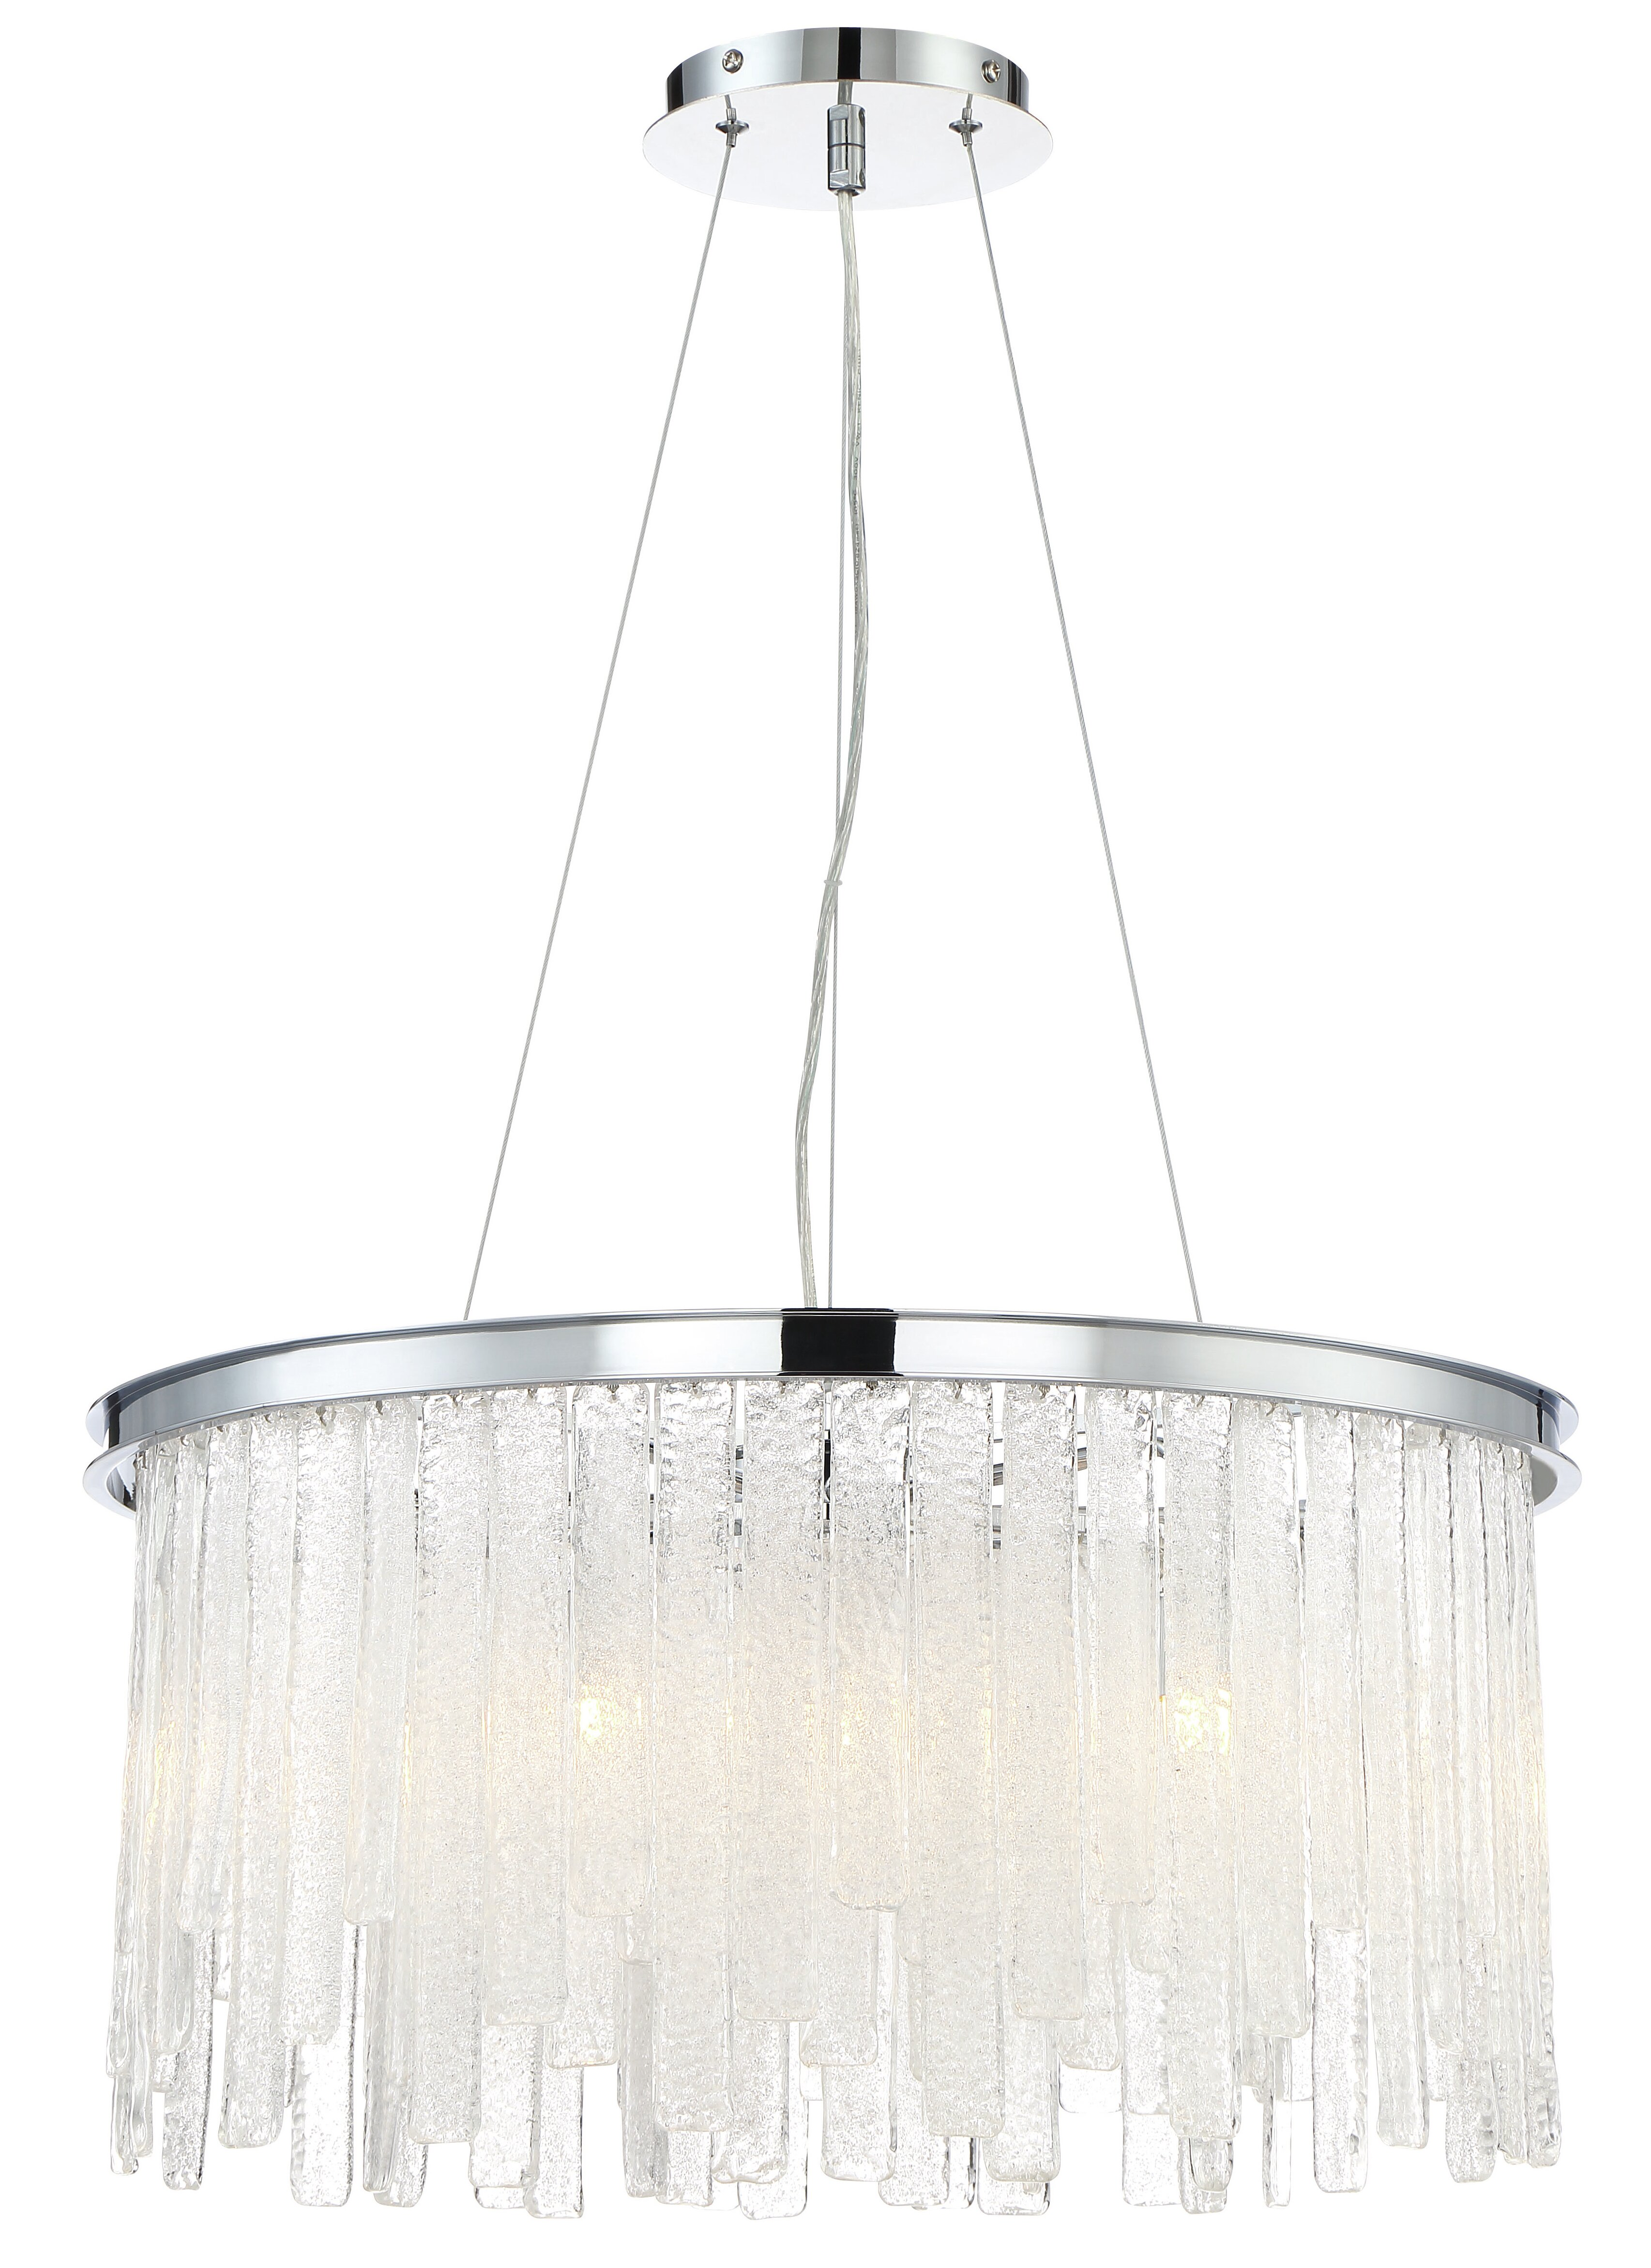 Orren Ellis Wanetta 10 Light Glass Crystal Drum Chandelier